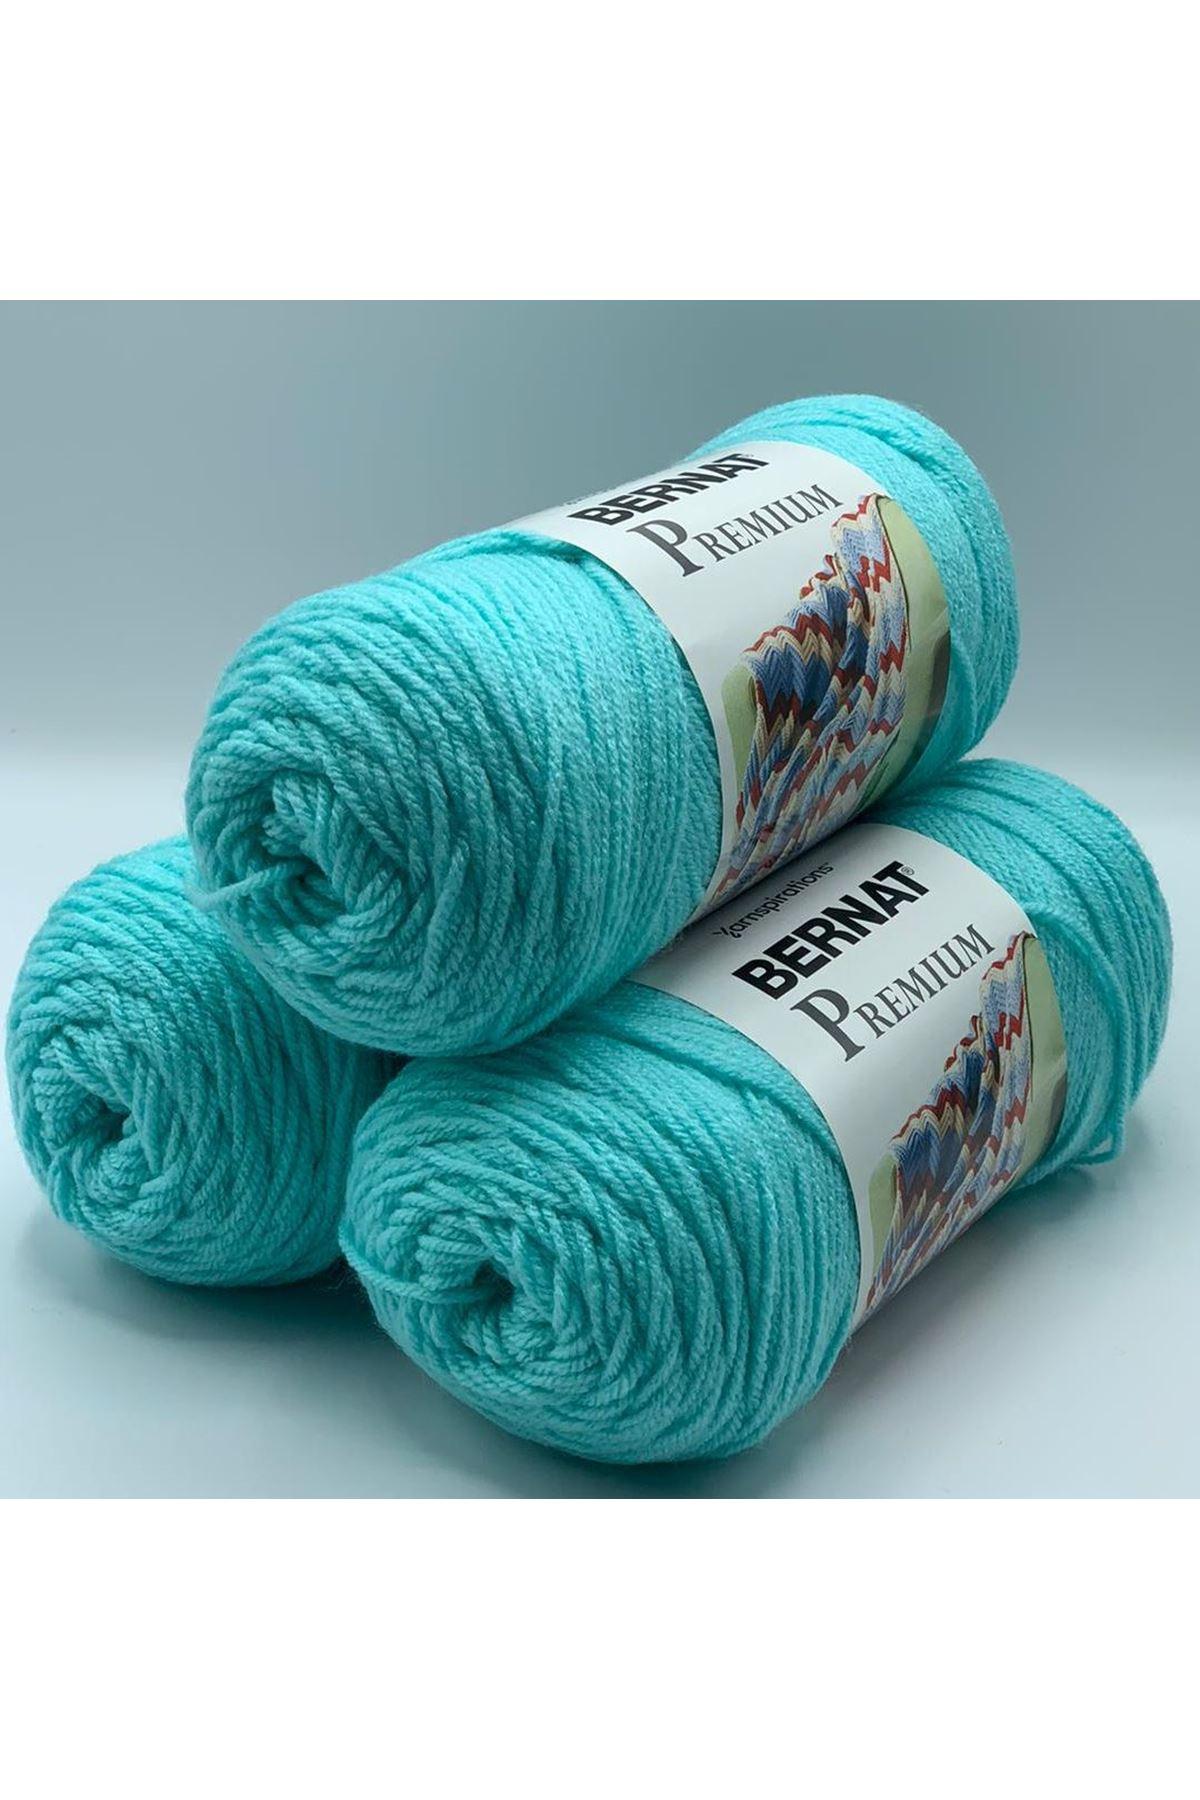 3'lü Paket Orijinal Bernat Premium Akrilik 600 gram 1141 Açık Mavi